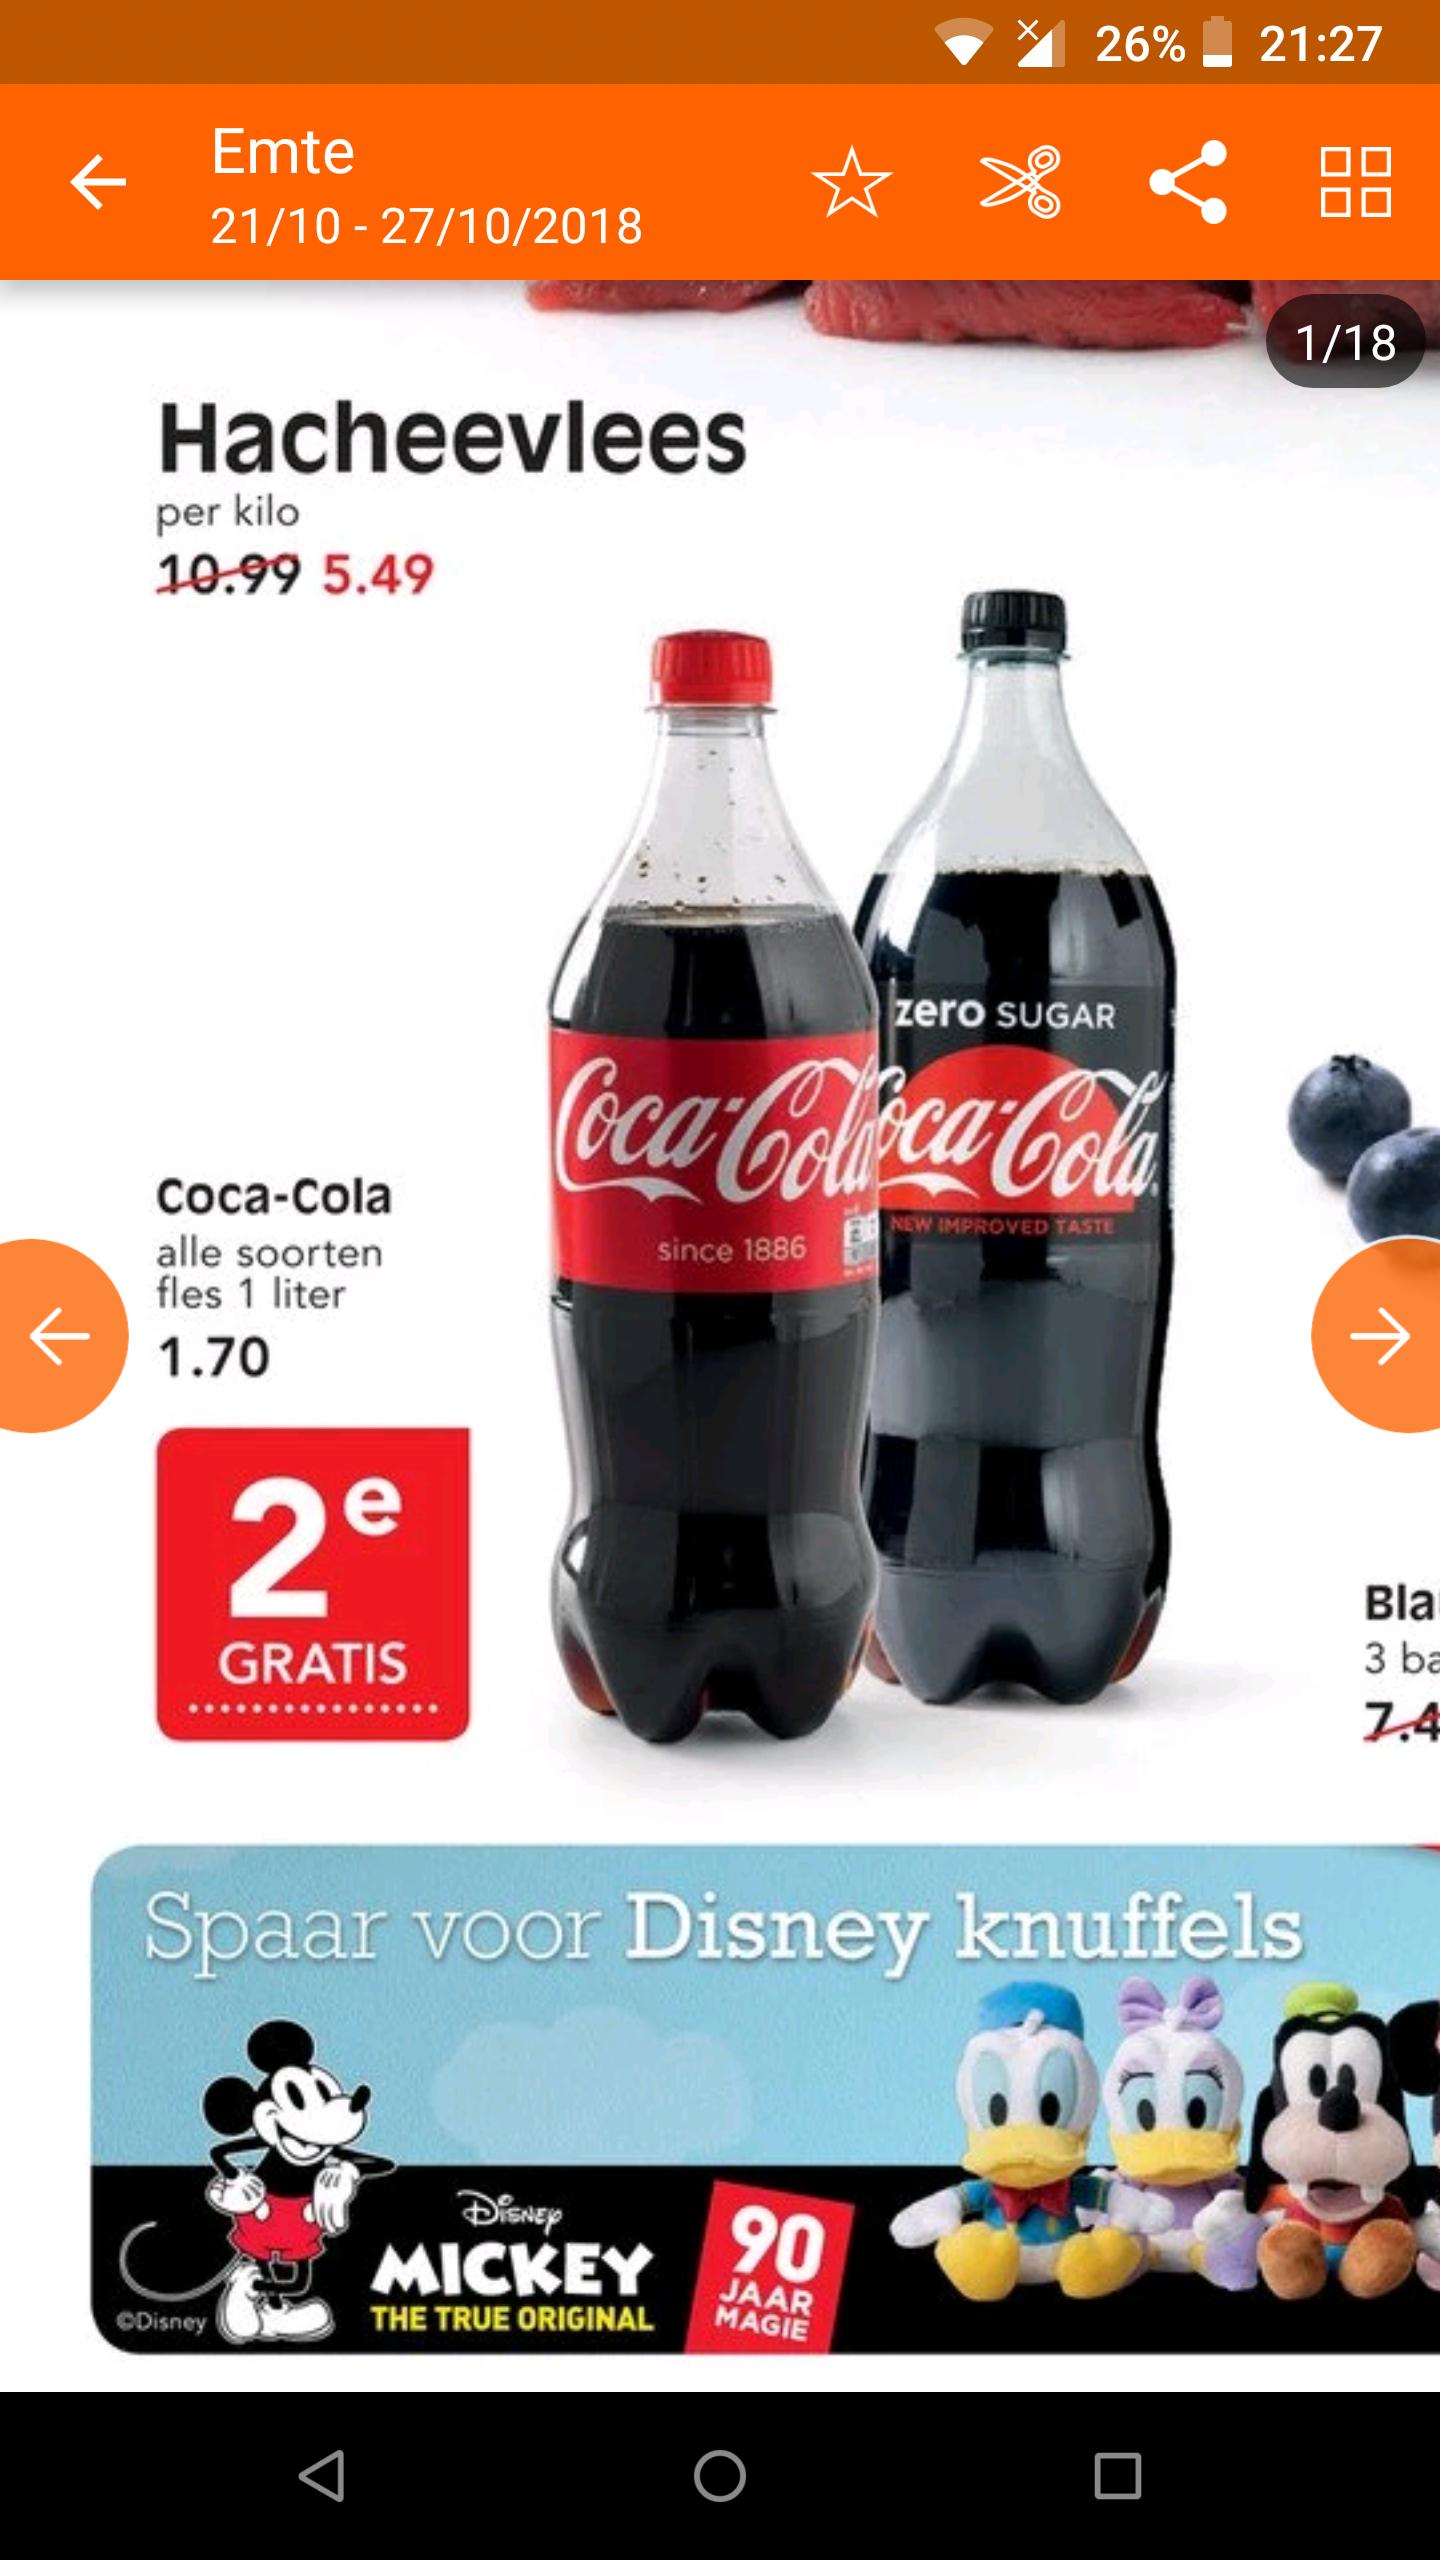 1 + 1 gratis op alle 1l Coca Cola bij Emté